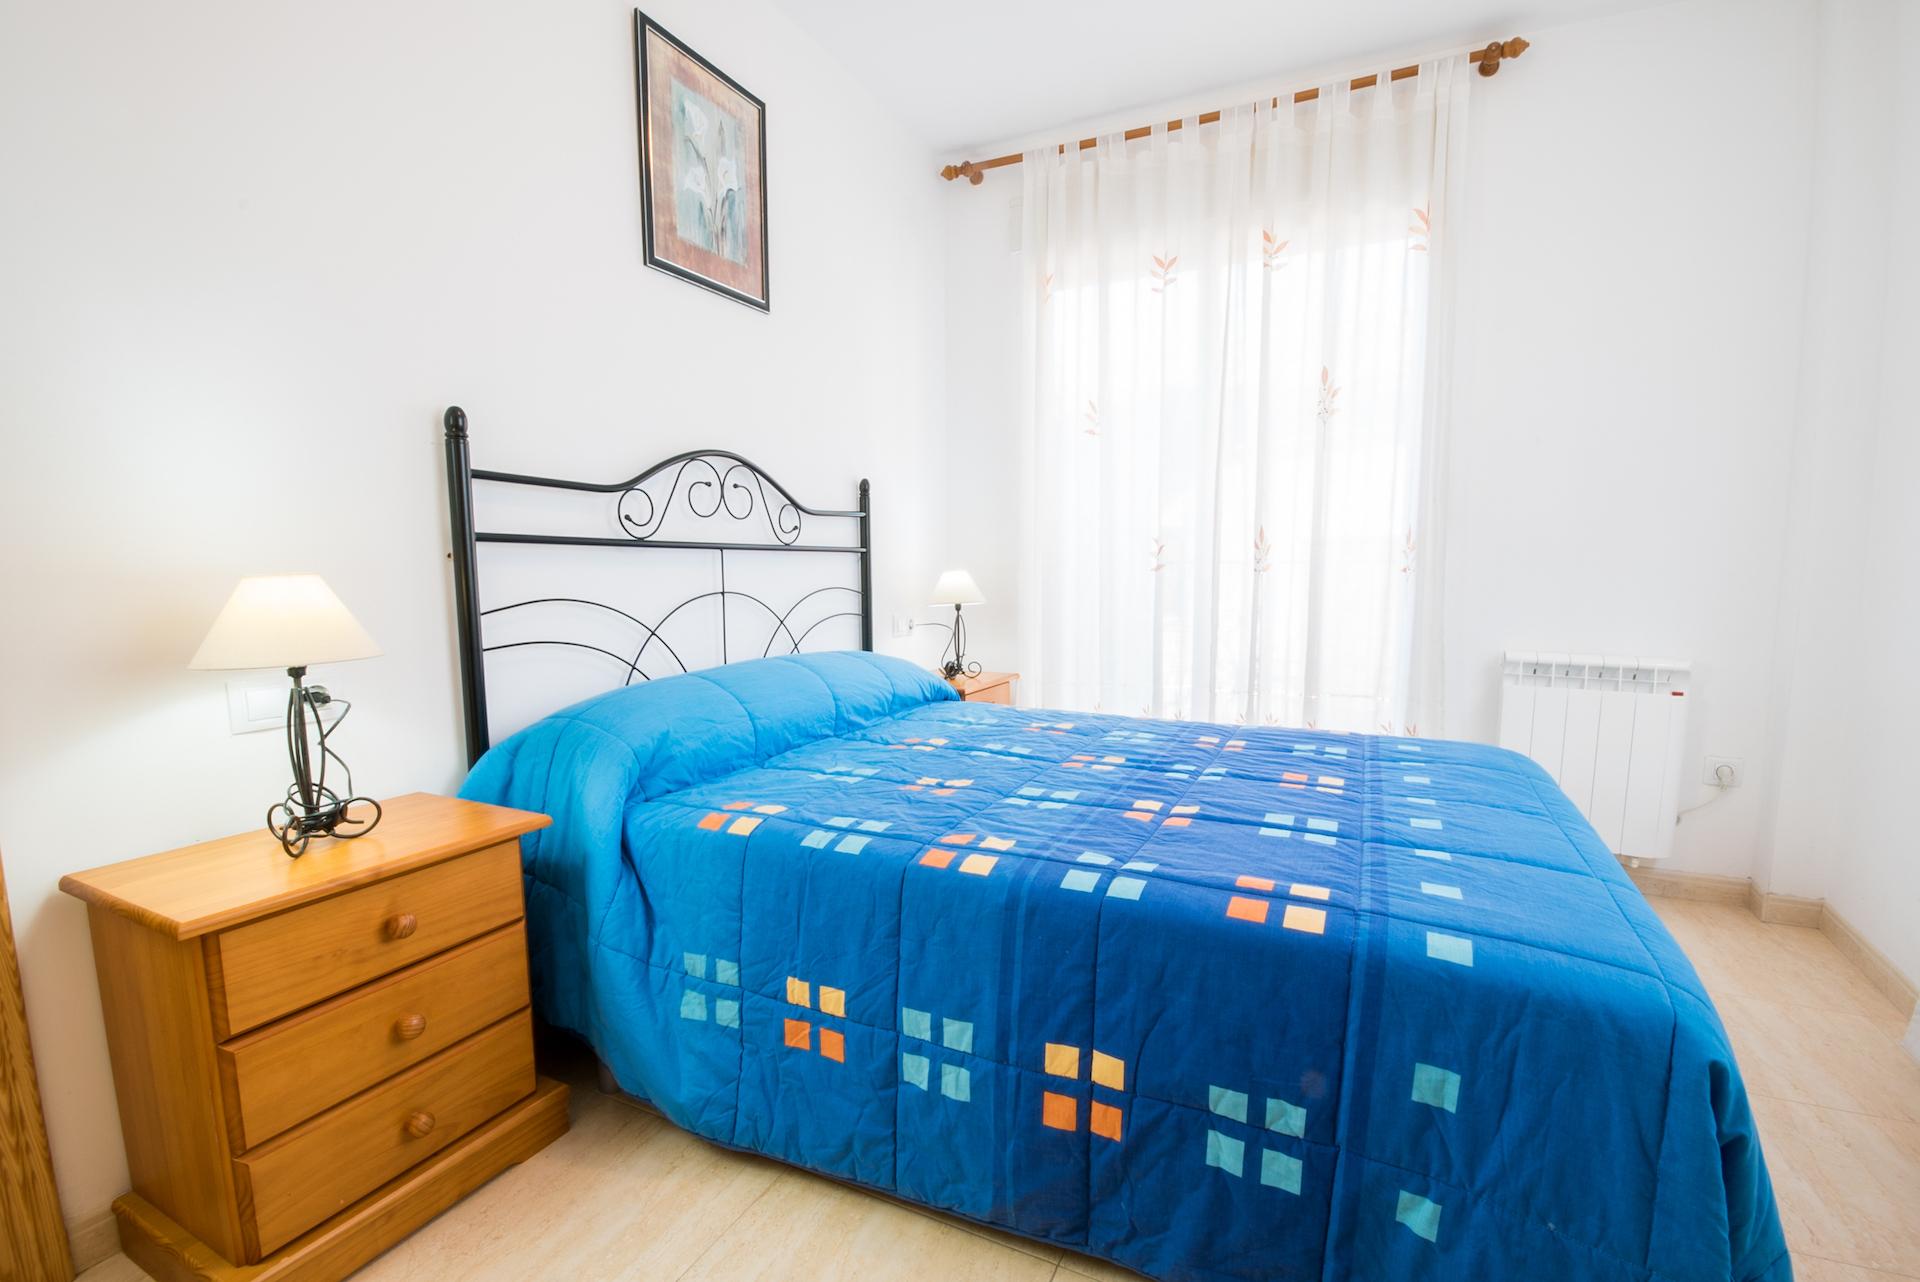 Apartamento Benafer 1 - Habitación Matrimonio